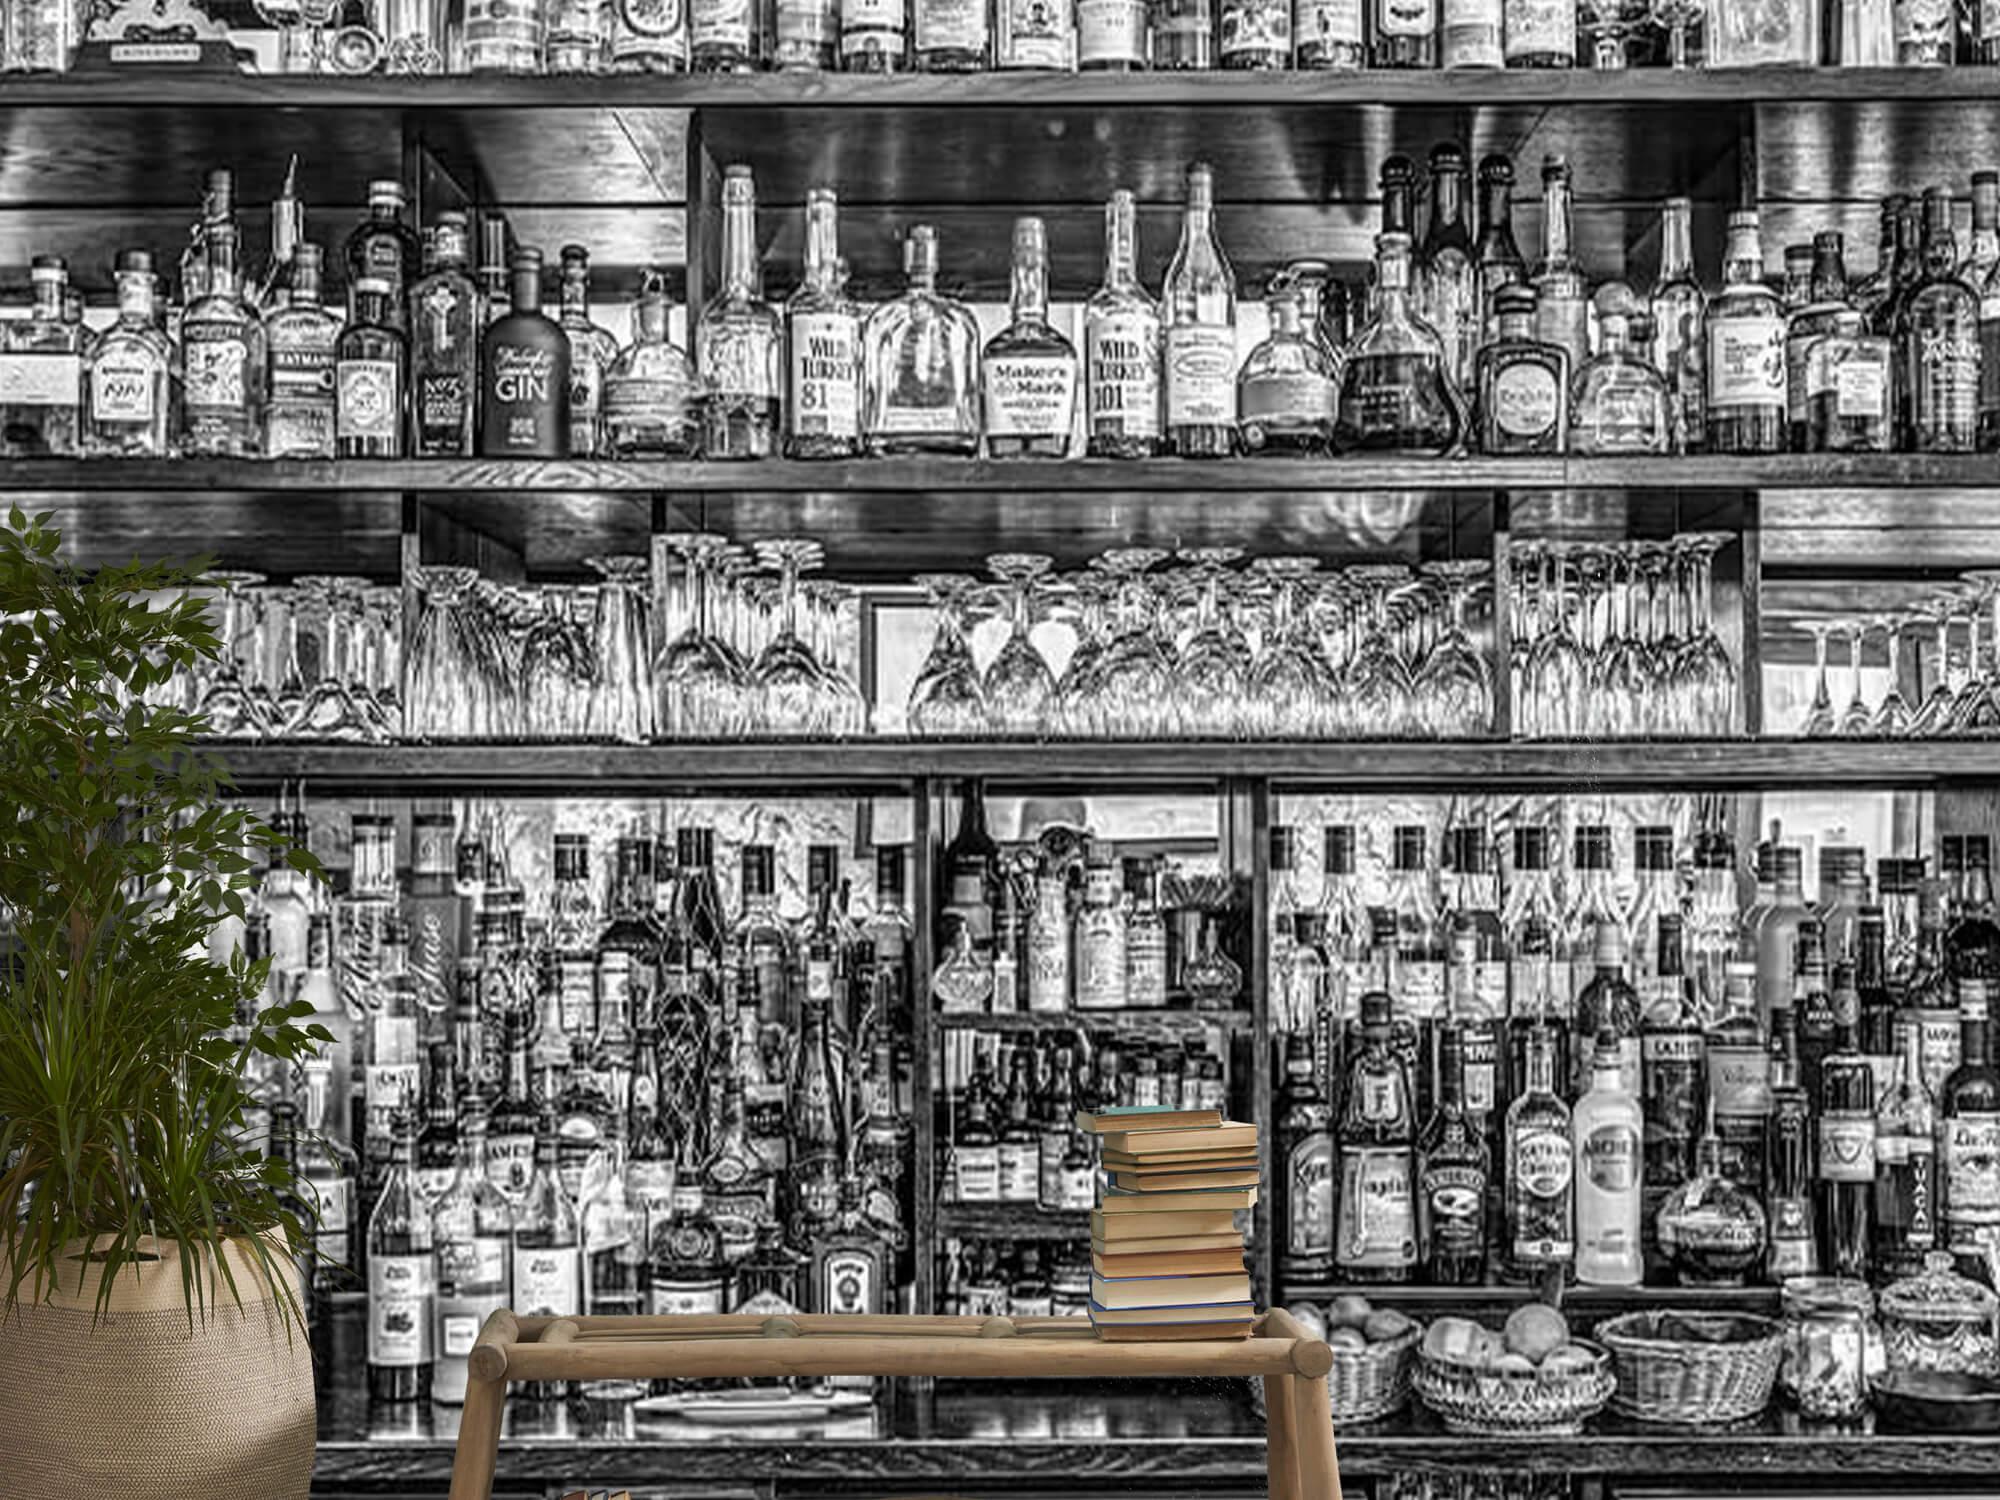 Bar in Birmingham 11